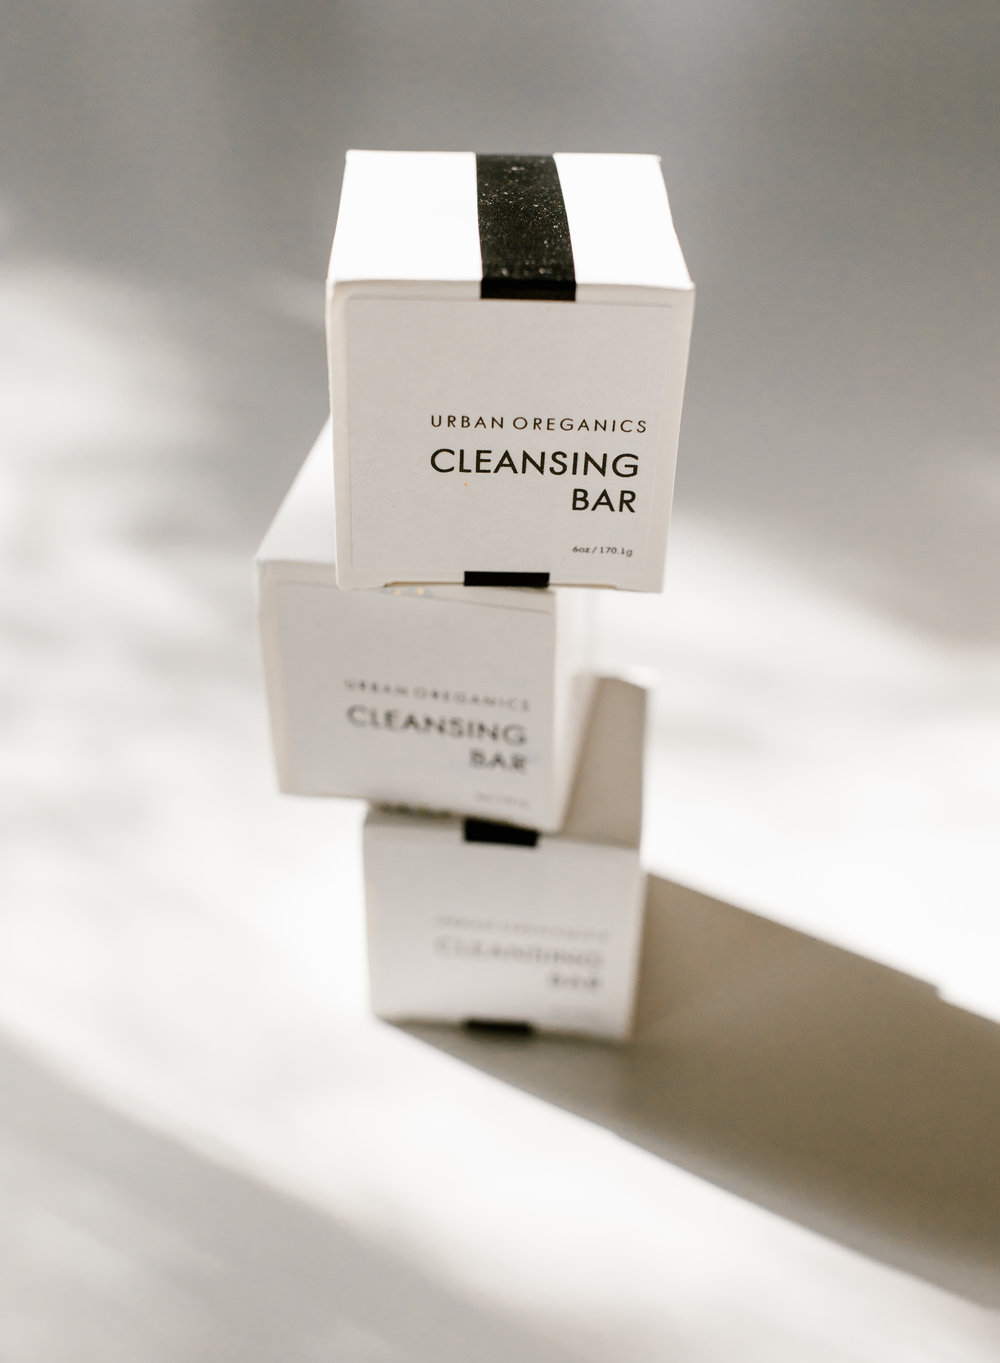 urban-oreganics-brand-photographer-cleansing-bar-100.jpg